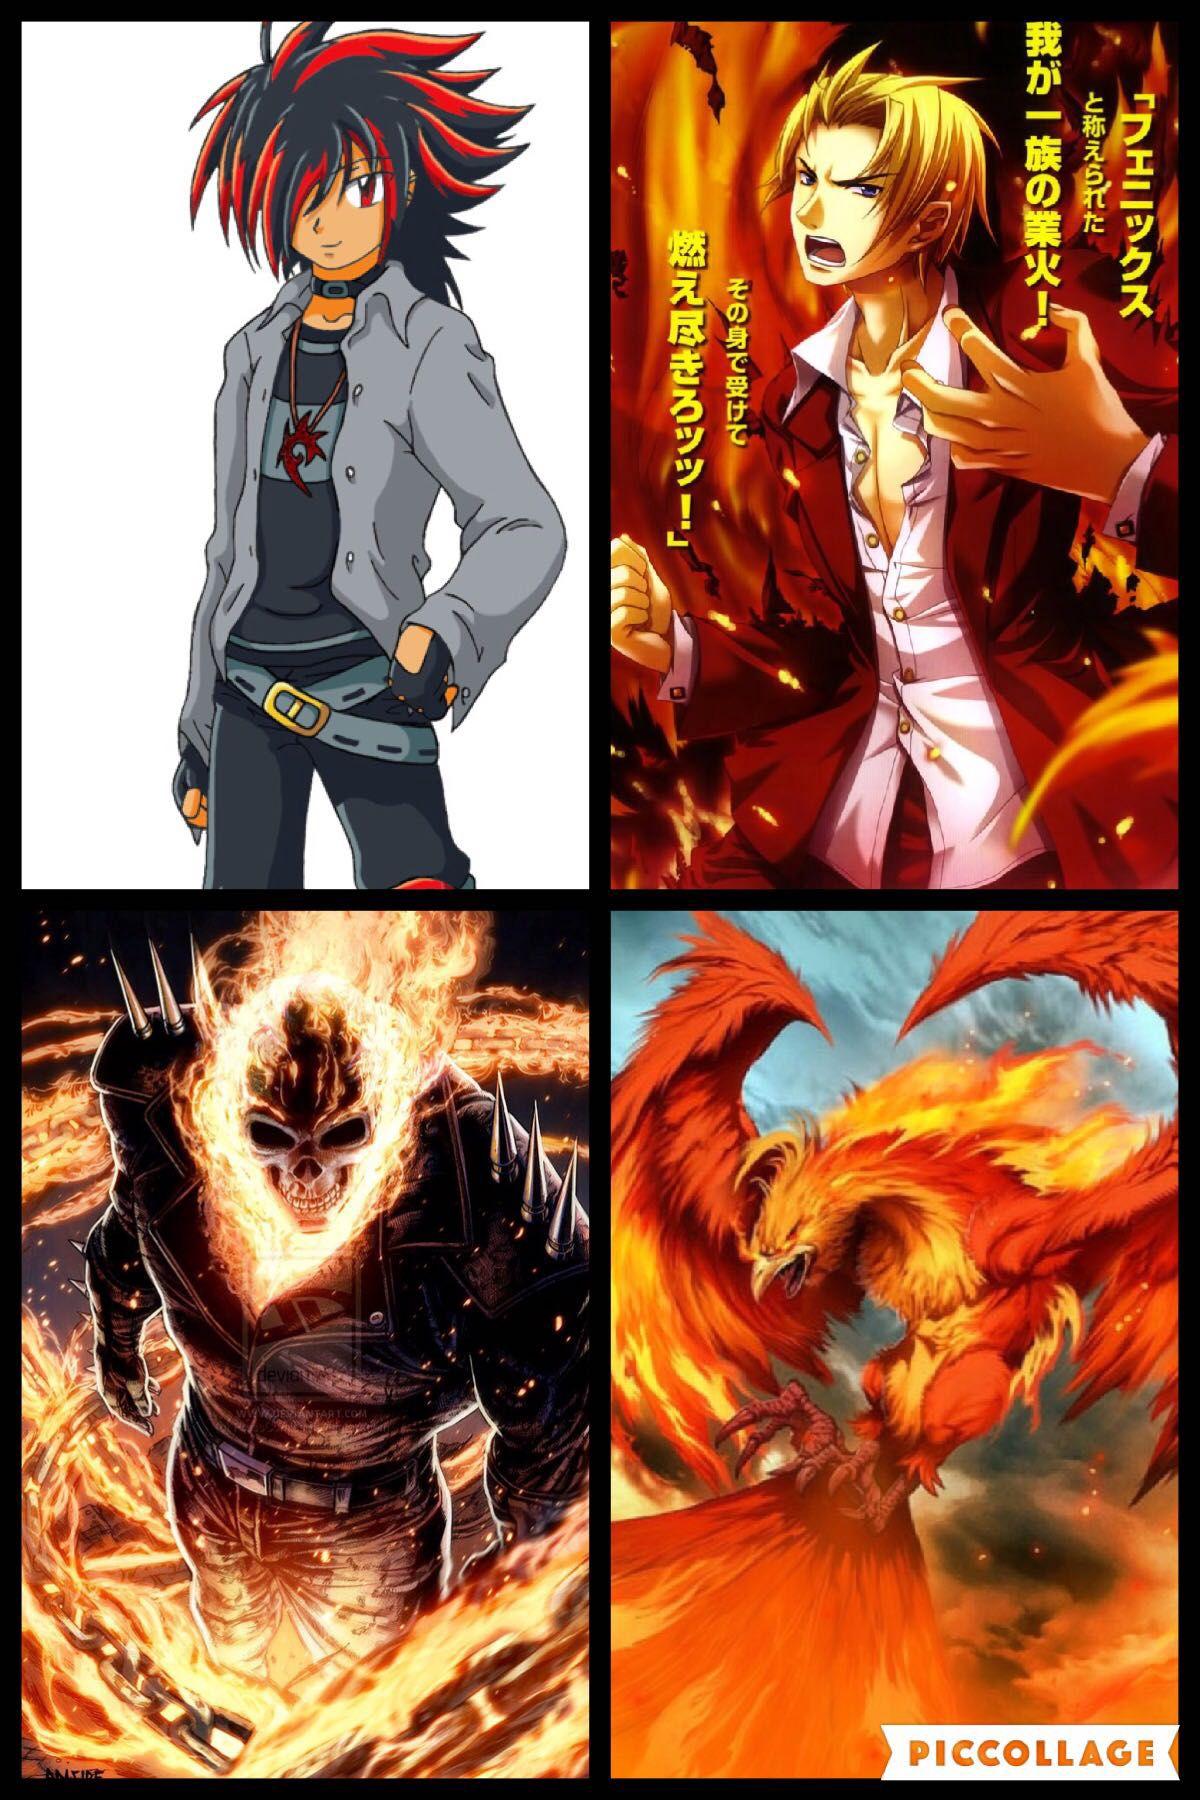 Highschool dxd+Ghost rider - Rider vs Phoenix - Wattpad